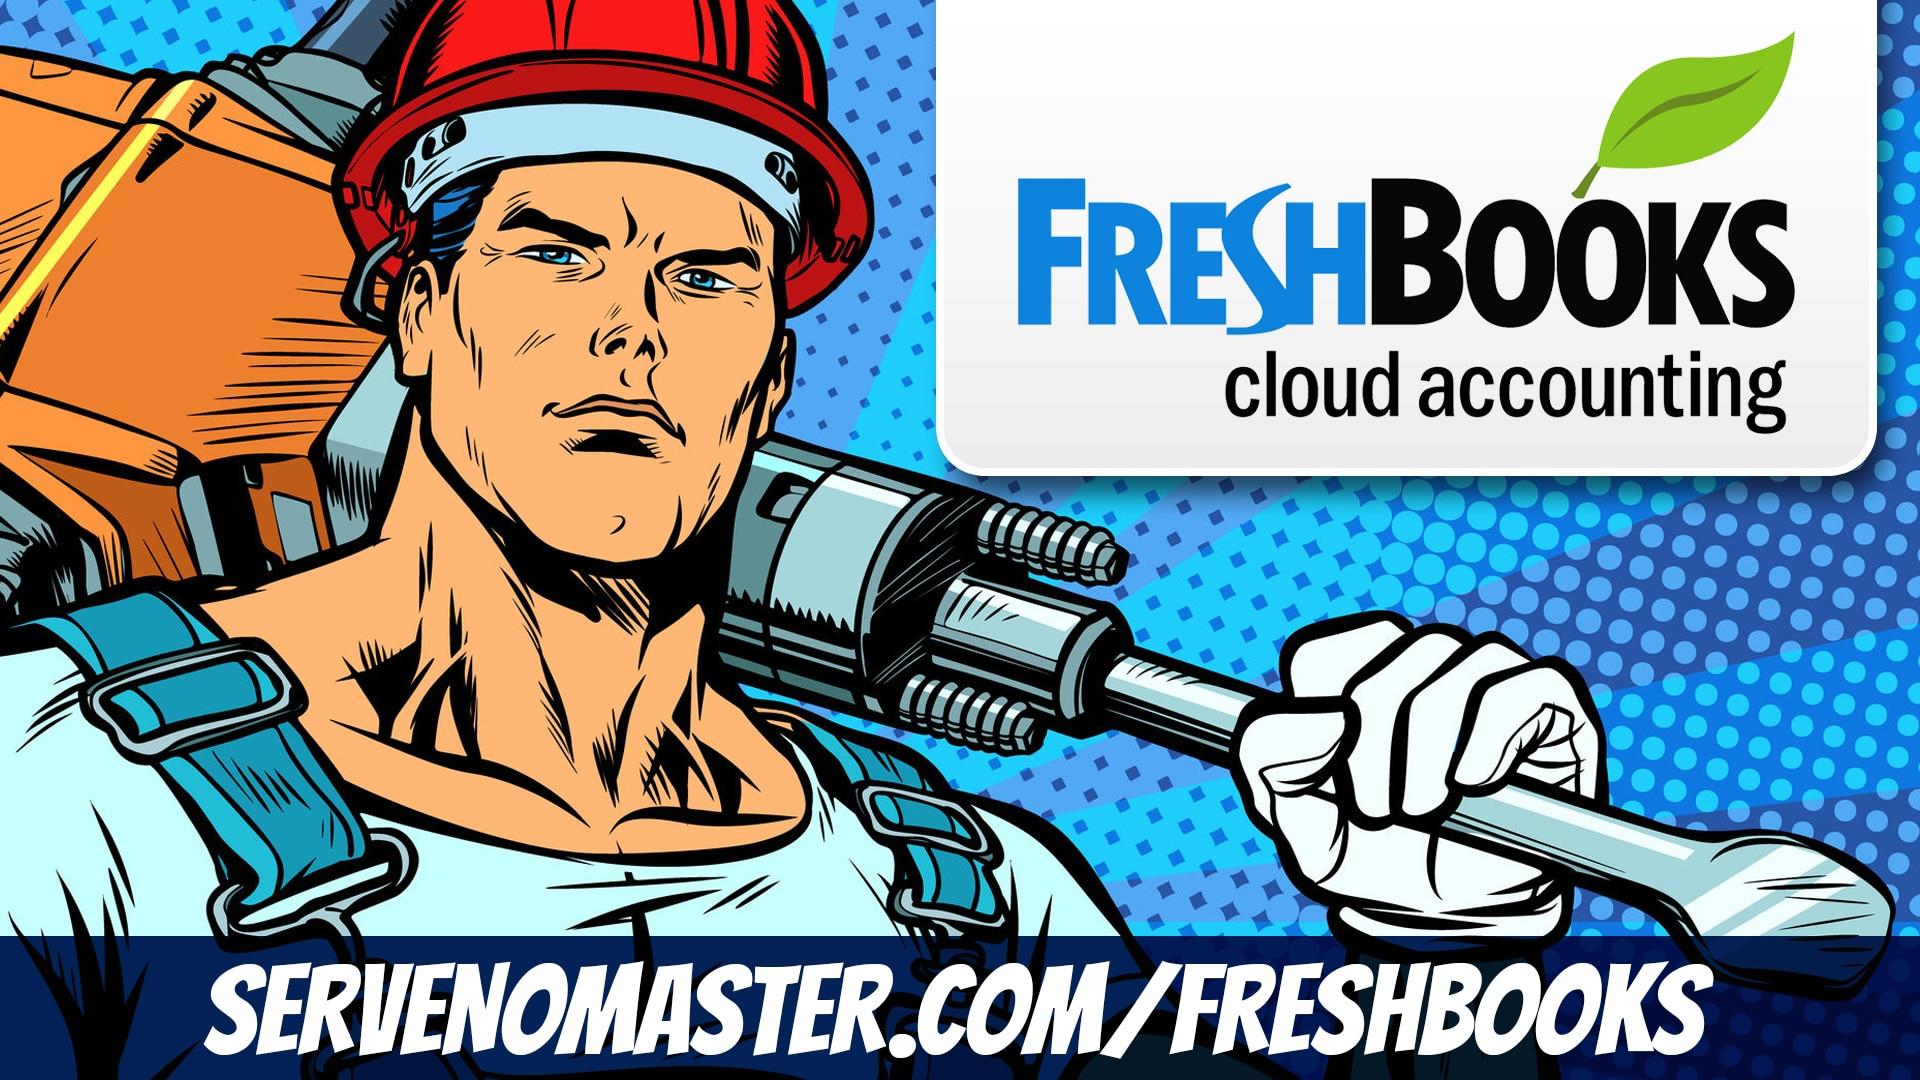 fresh books brand banner animated